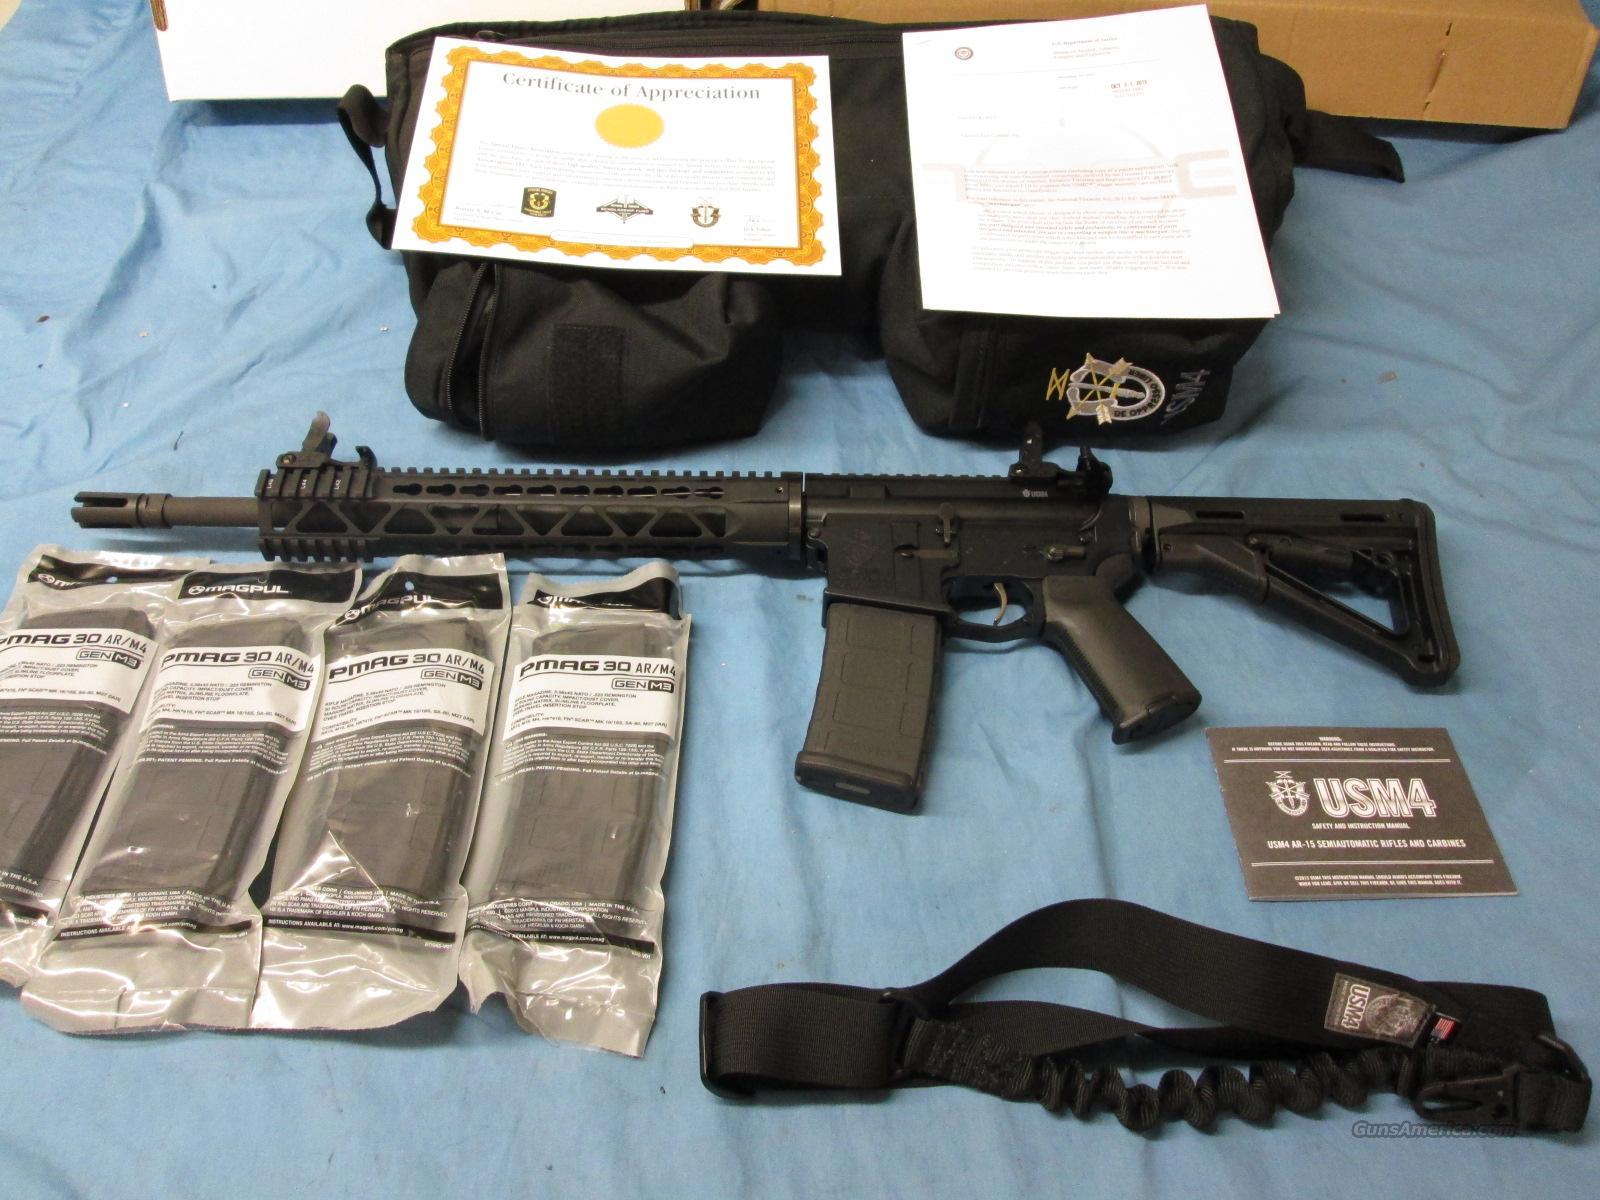 AR15 USM4 Mode 3 TacCon 3MR   Guns > Rifles > AR-15 Rifles - Small Manufacturers > Complete Rifle